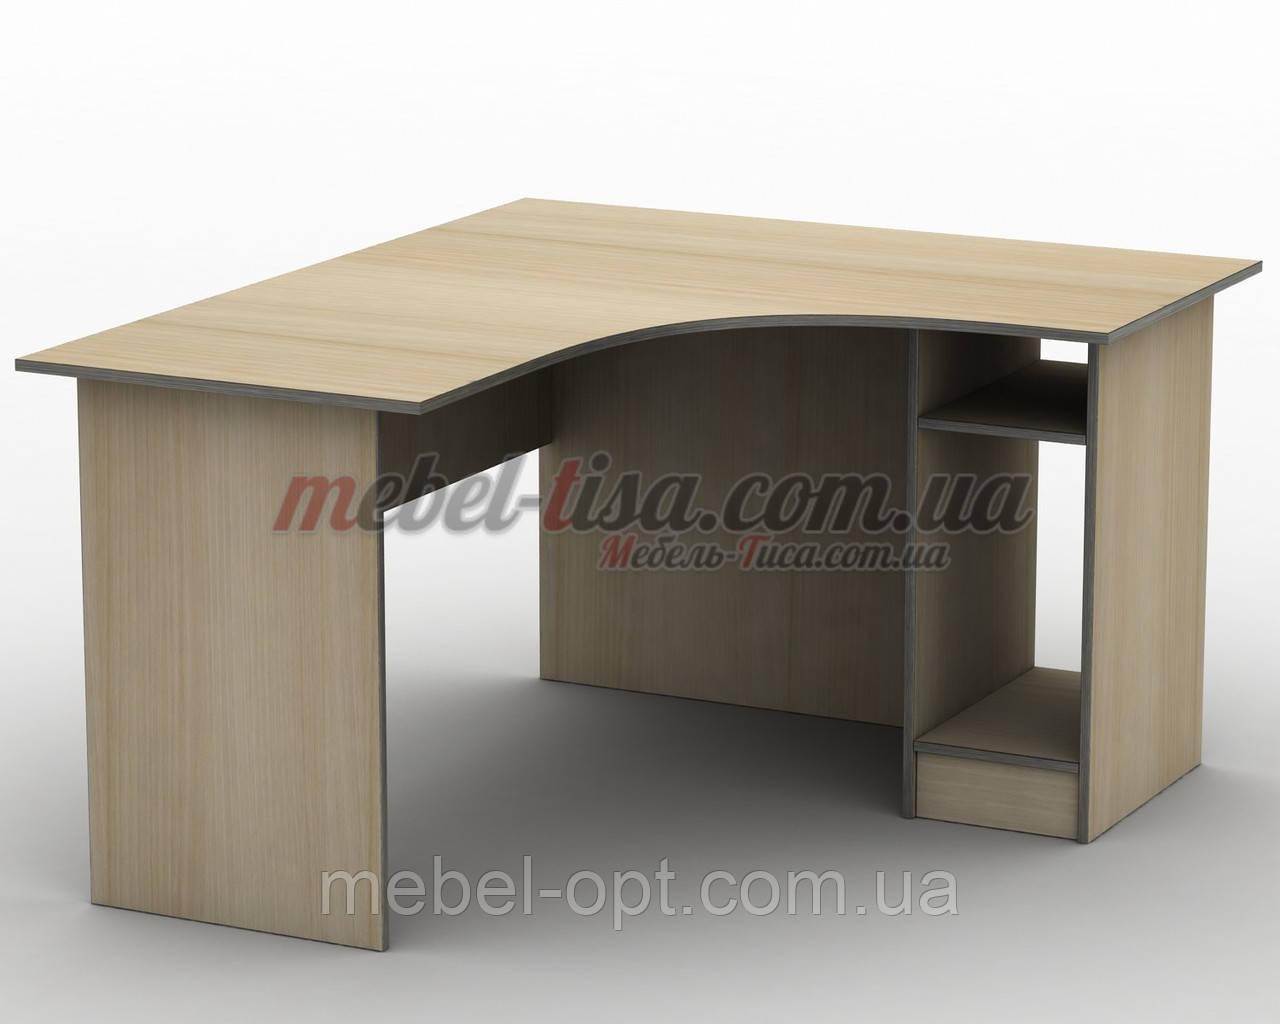 Компьютерный стол Бюджет СПУ-2\3